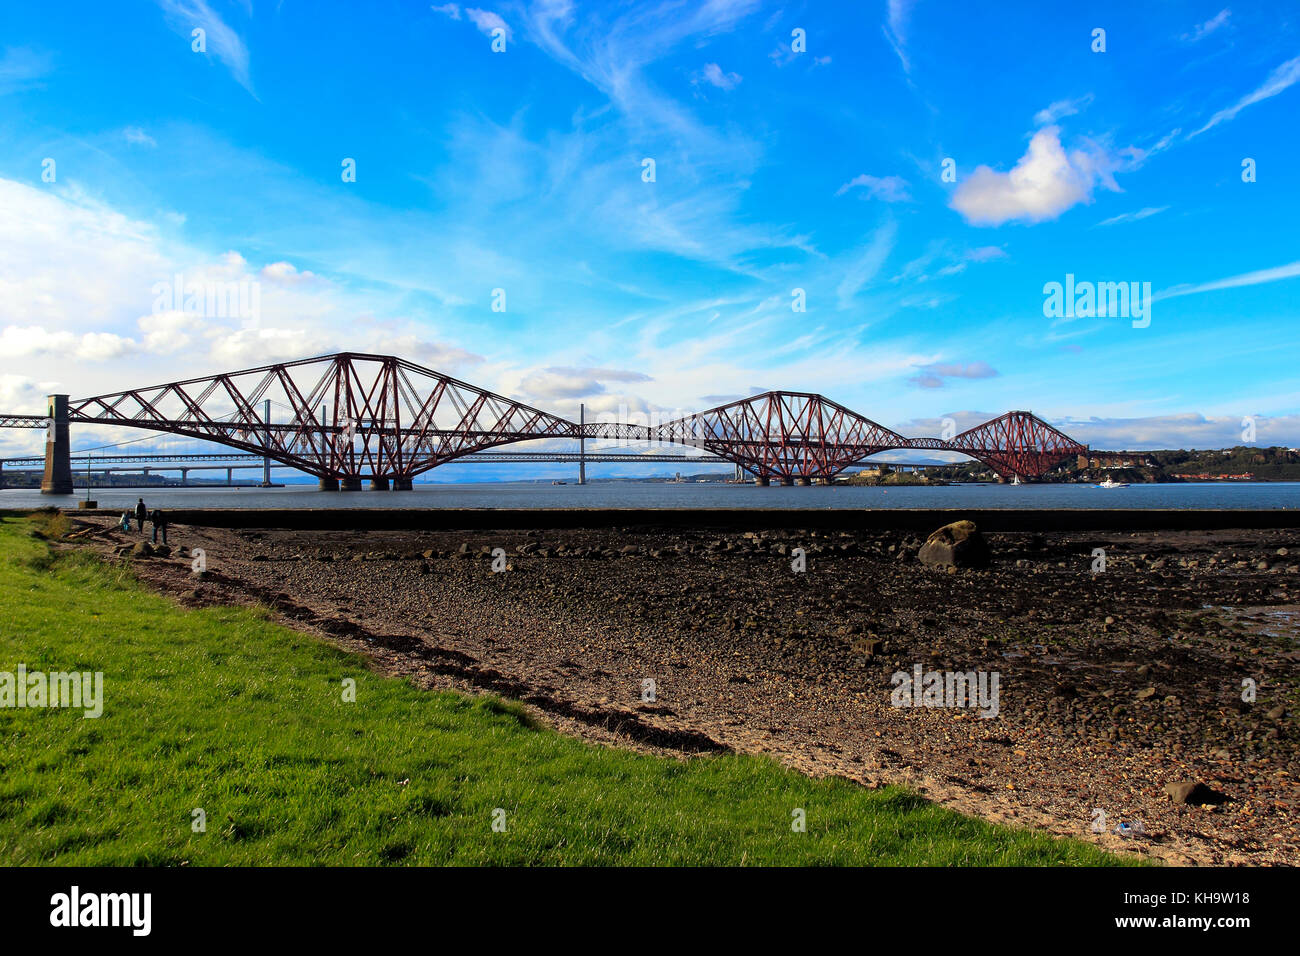 Forth Bridges, Whitehouse Bay, South Queensferry, Edinburgh, Scotland, UK - Stock Image